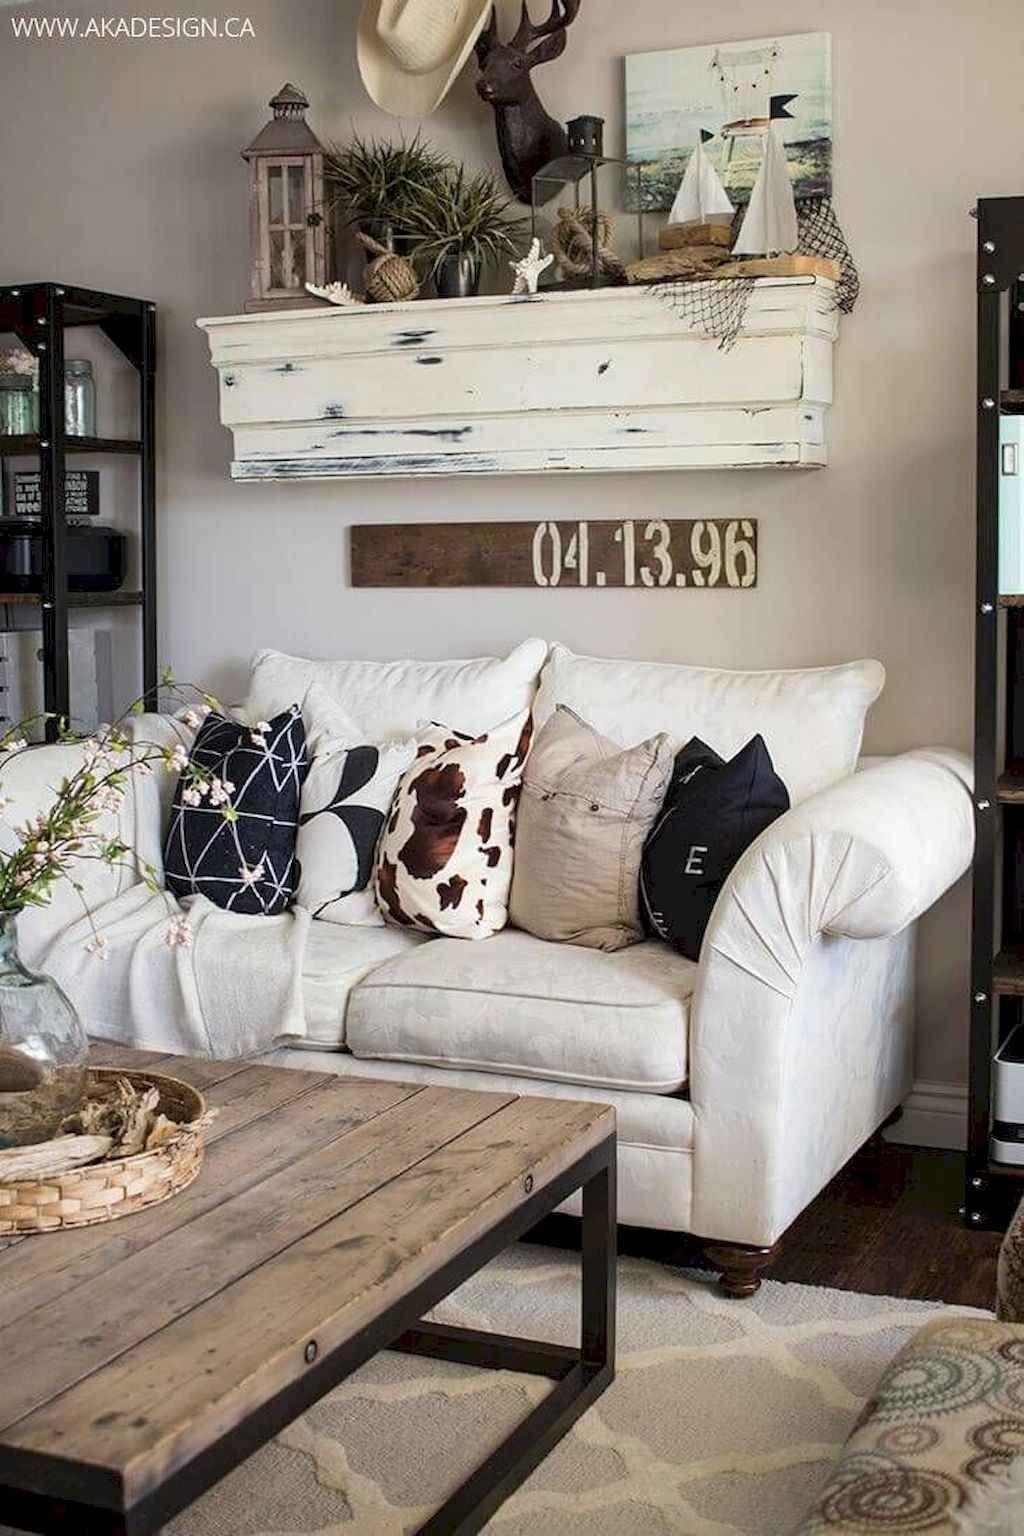 50 Best Rustic Apartment Living Room Decor Ideas And Makeover Living Room Decor Country Living Room Decor Rustic Farm House Living Room #rustic #apartment #living #room